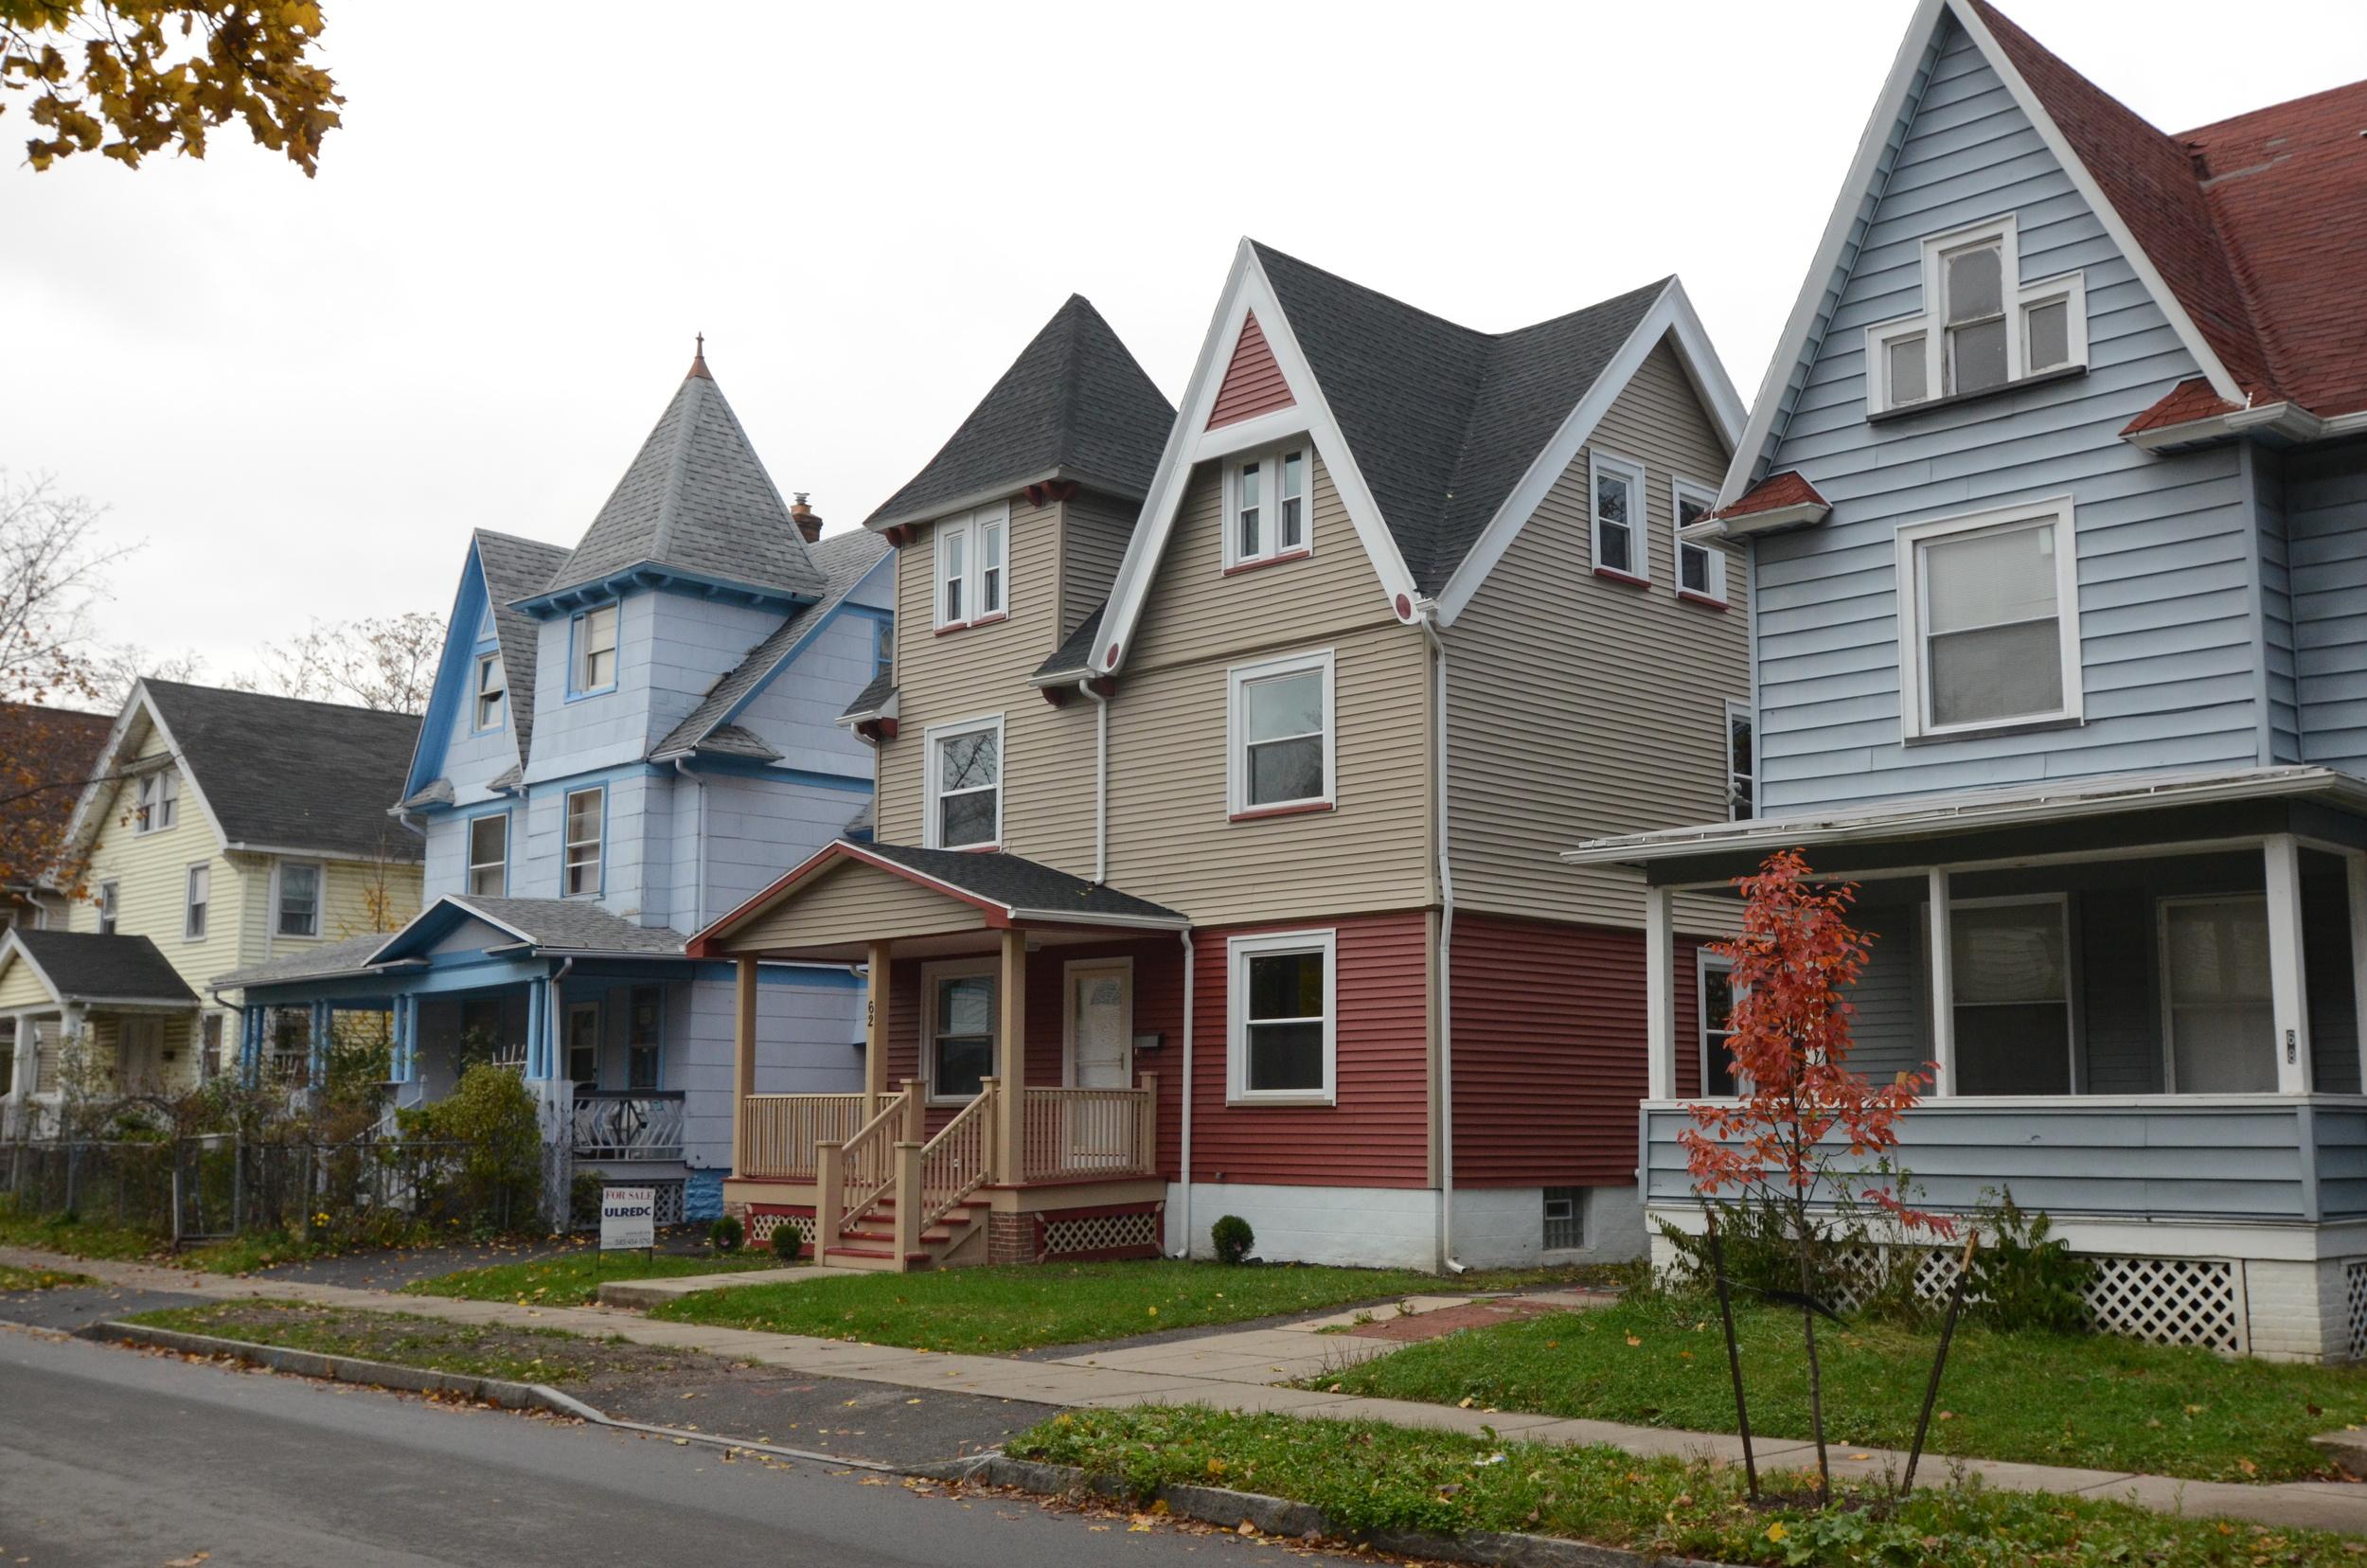 Photo: Communications Bureau City of Rochester